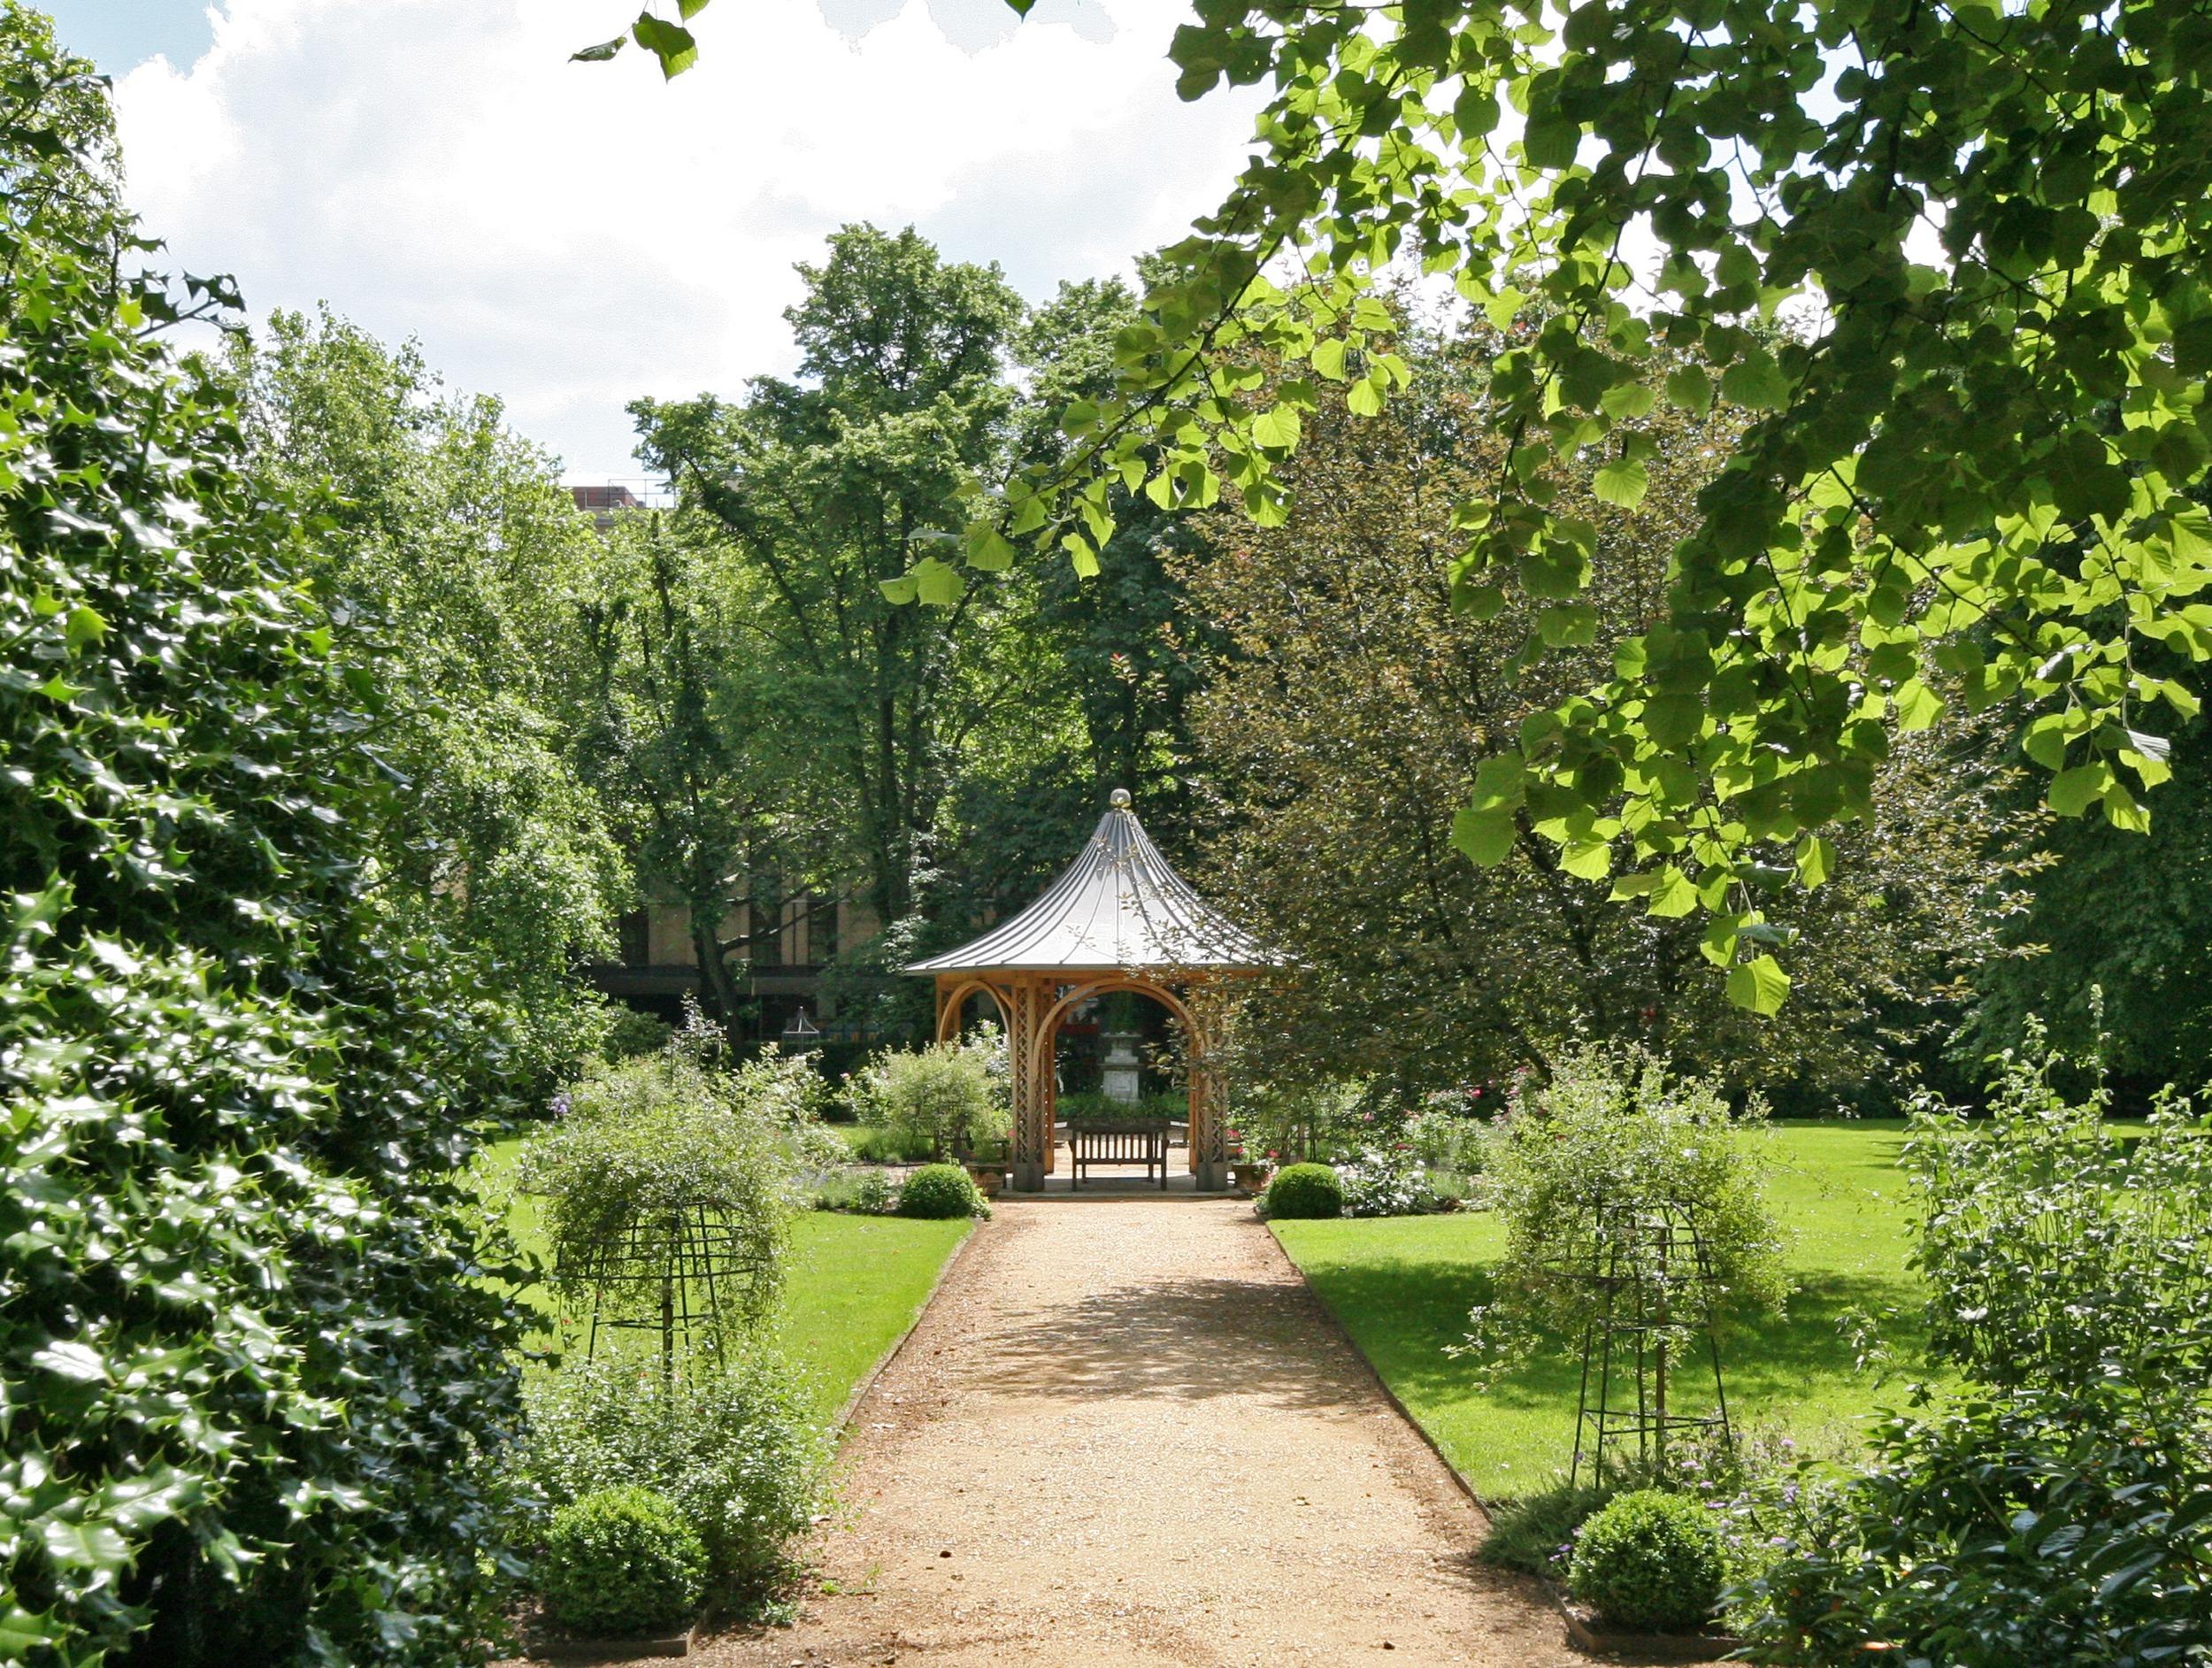 dowling jones communal gardens notting hill